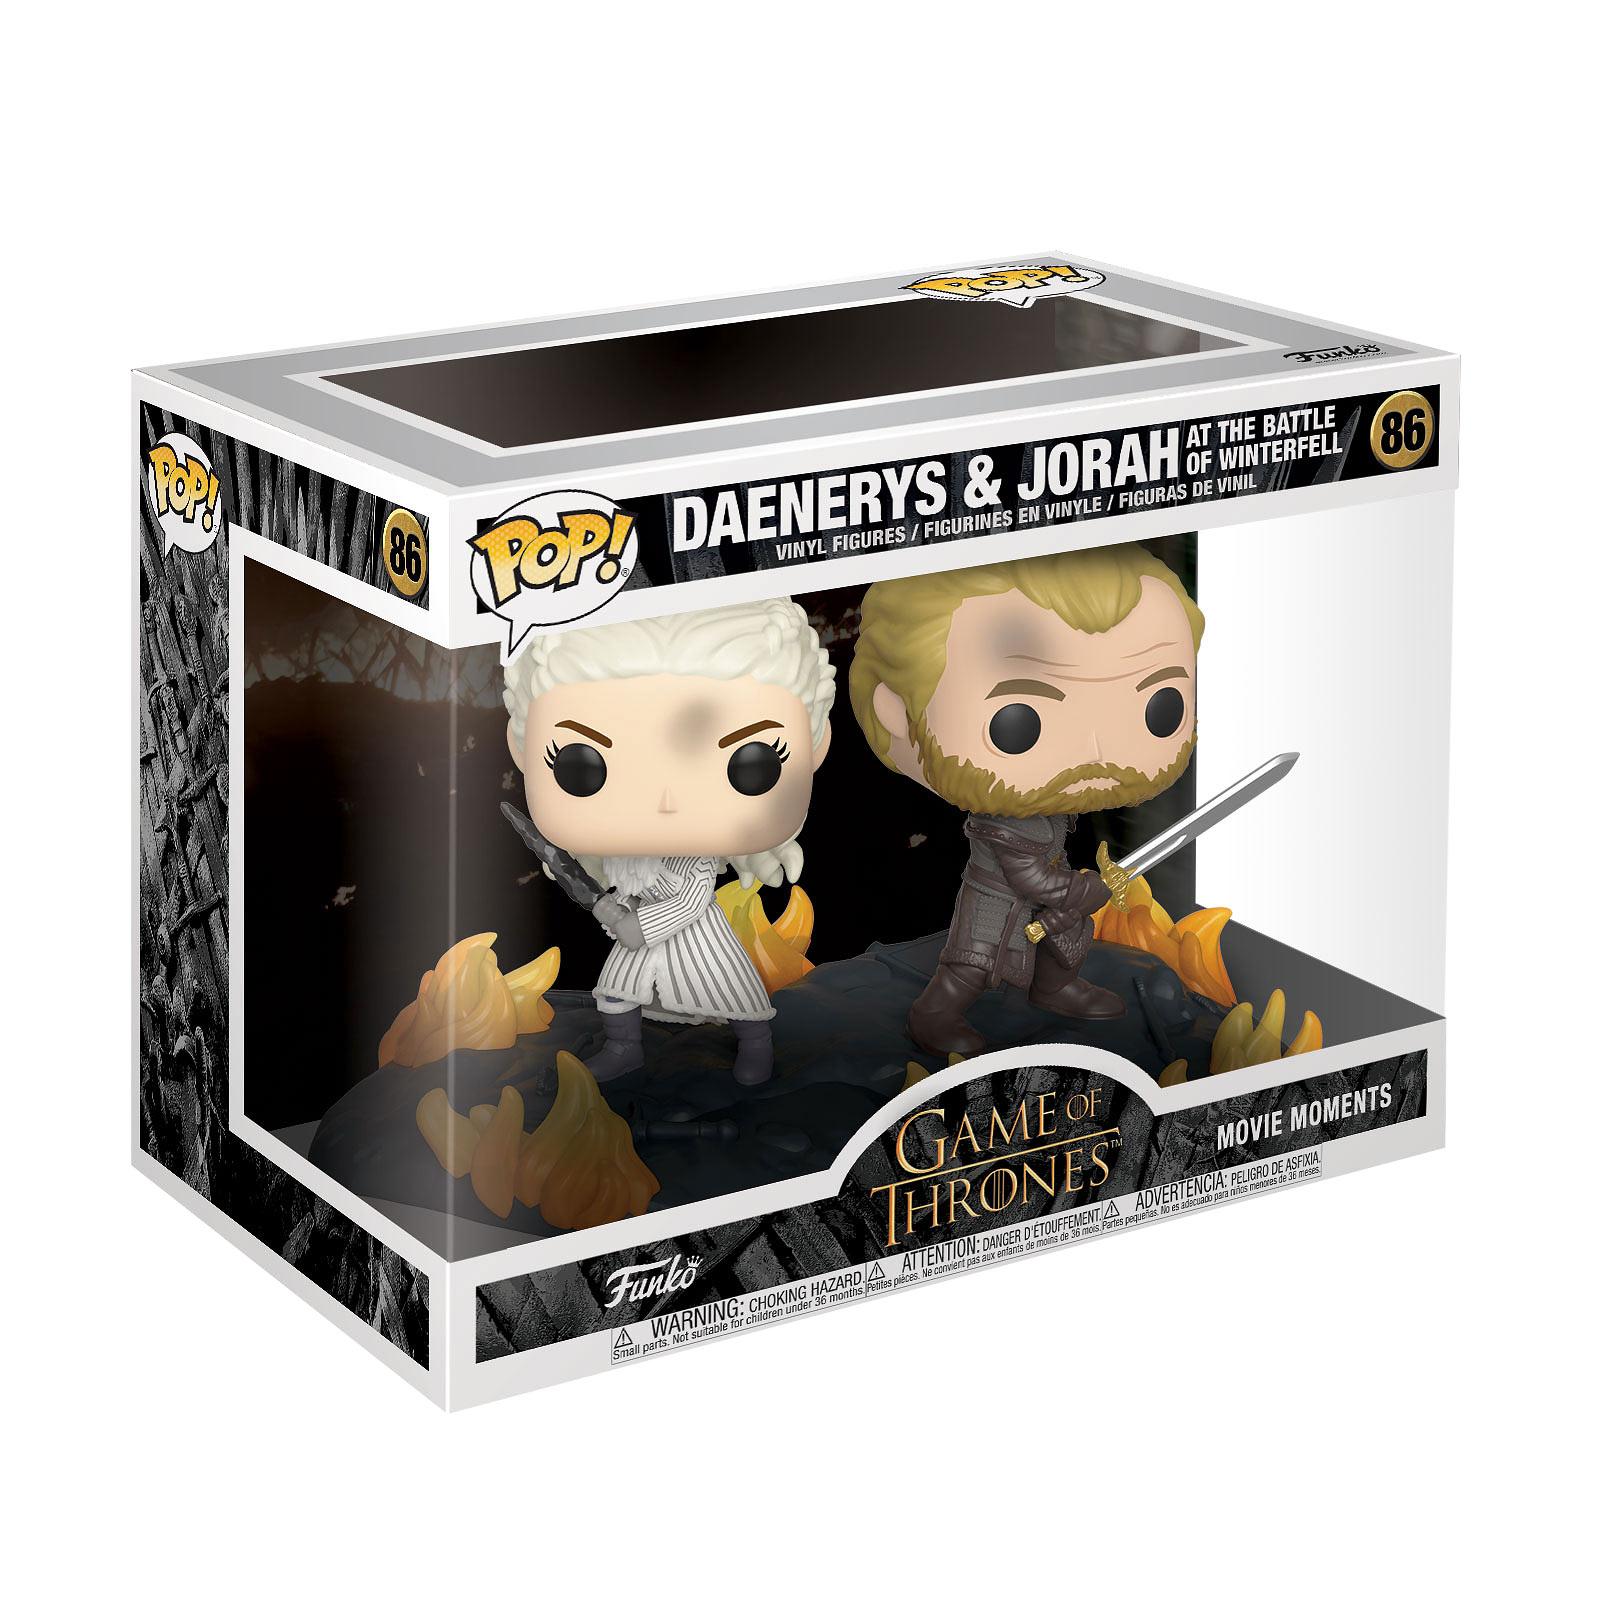 Game of Thrones - Daenerys & Jorah Funko Pop Figur